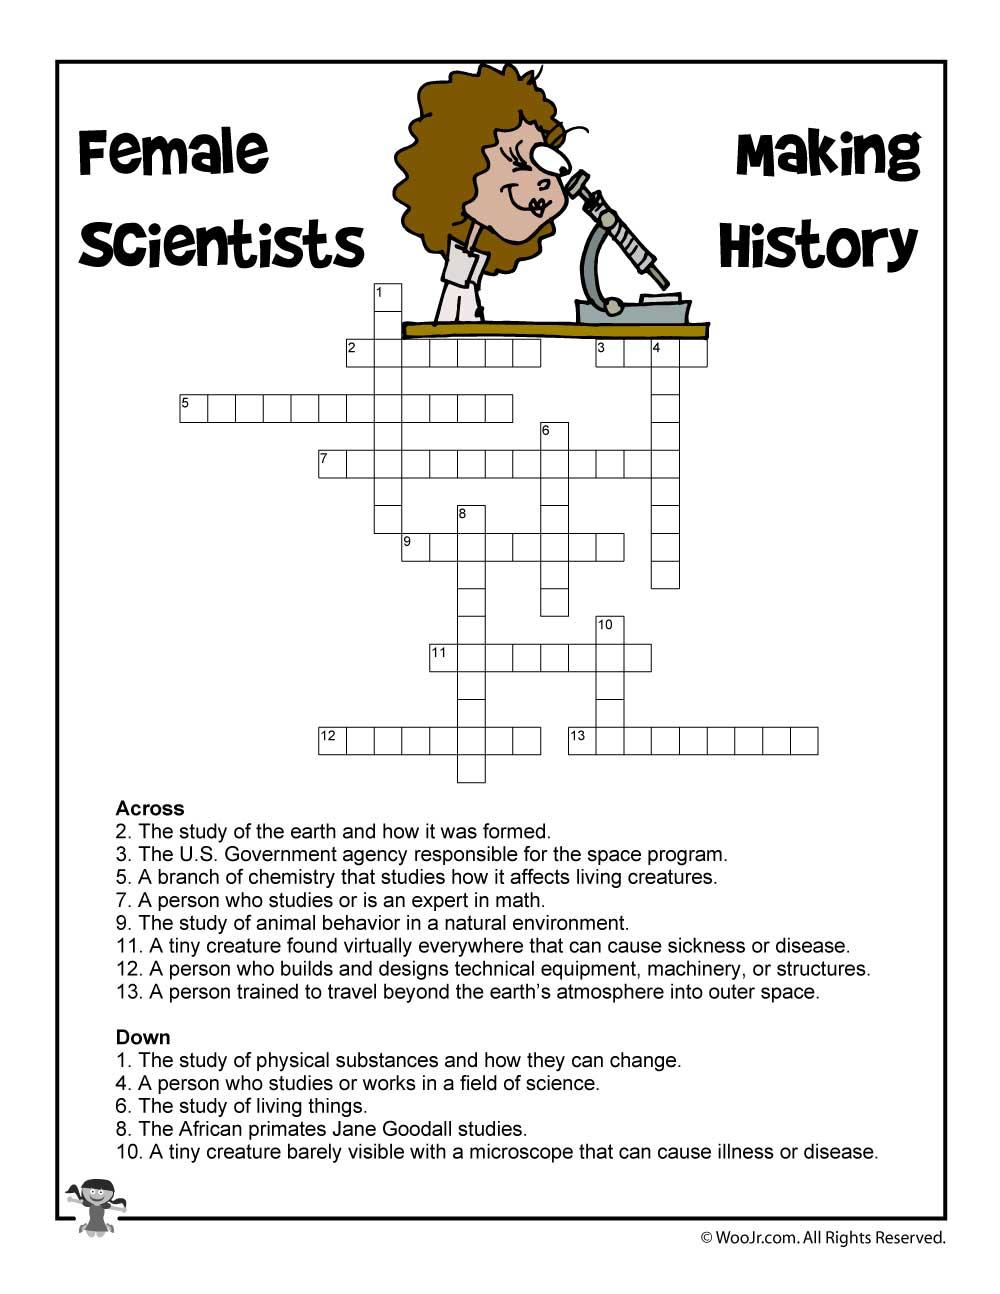 Female Scientists Crossword Puzzle | Woo! Jr. Kids Activities - Print Your Puzzle